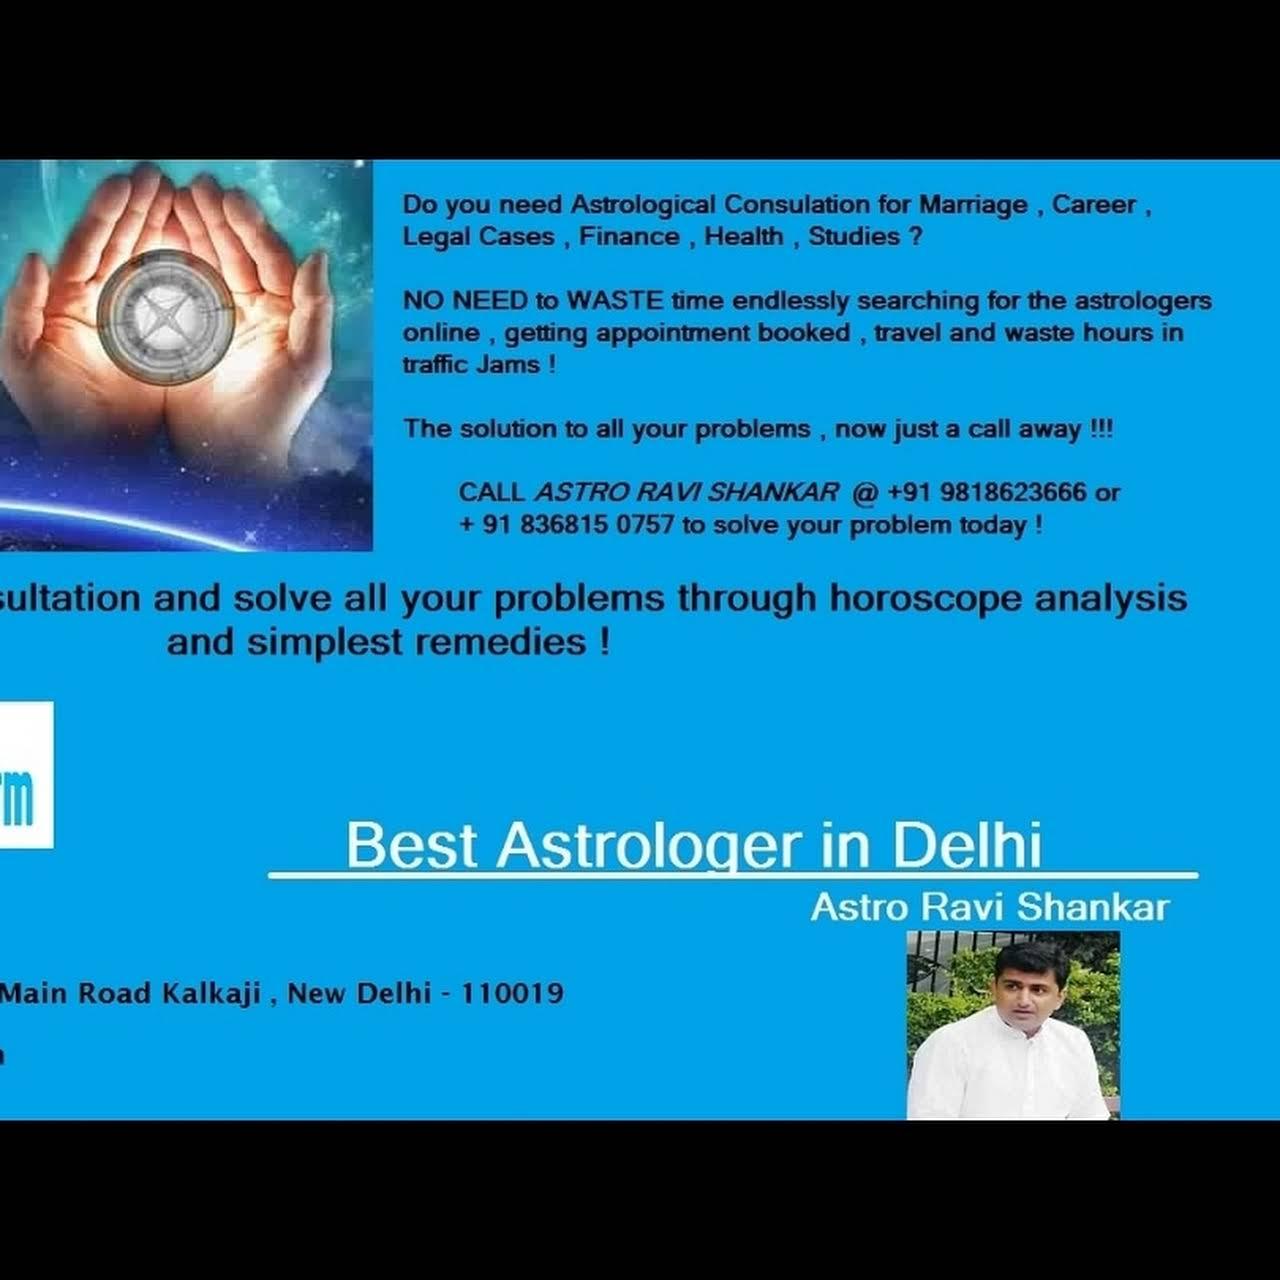 Astrologer in Delhi (Nakshatra 13) - Astrologer in New Delhi